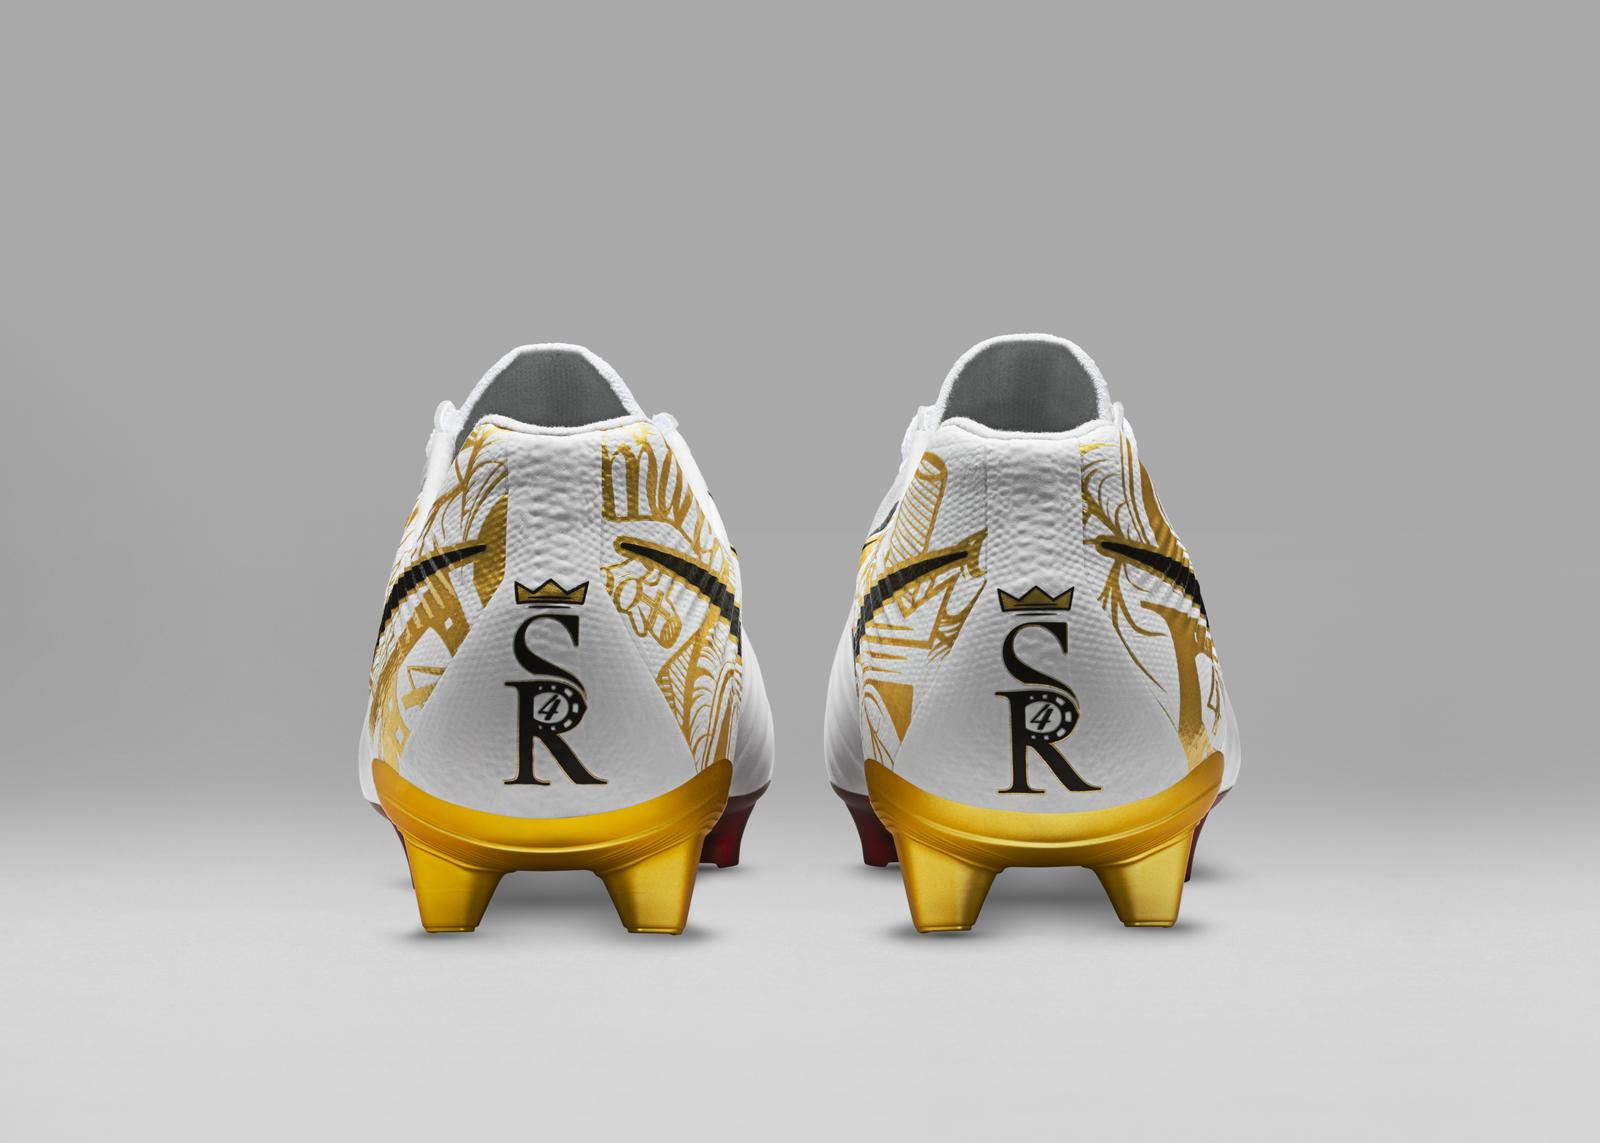 sergio ramos shoes nike